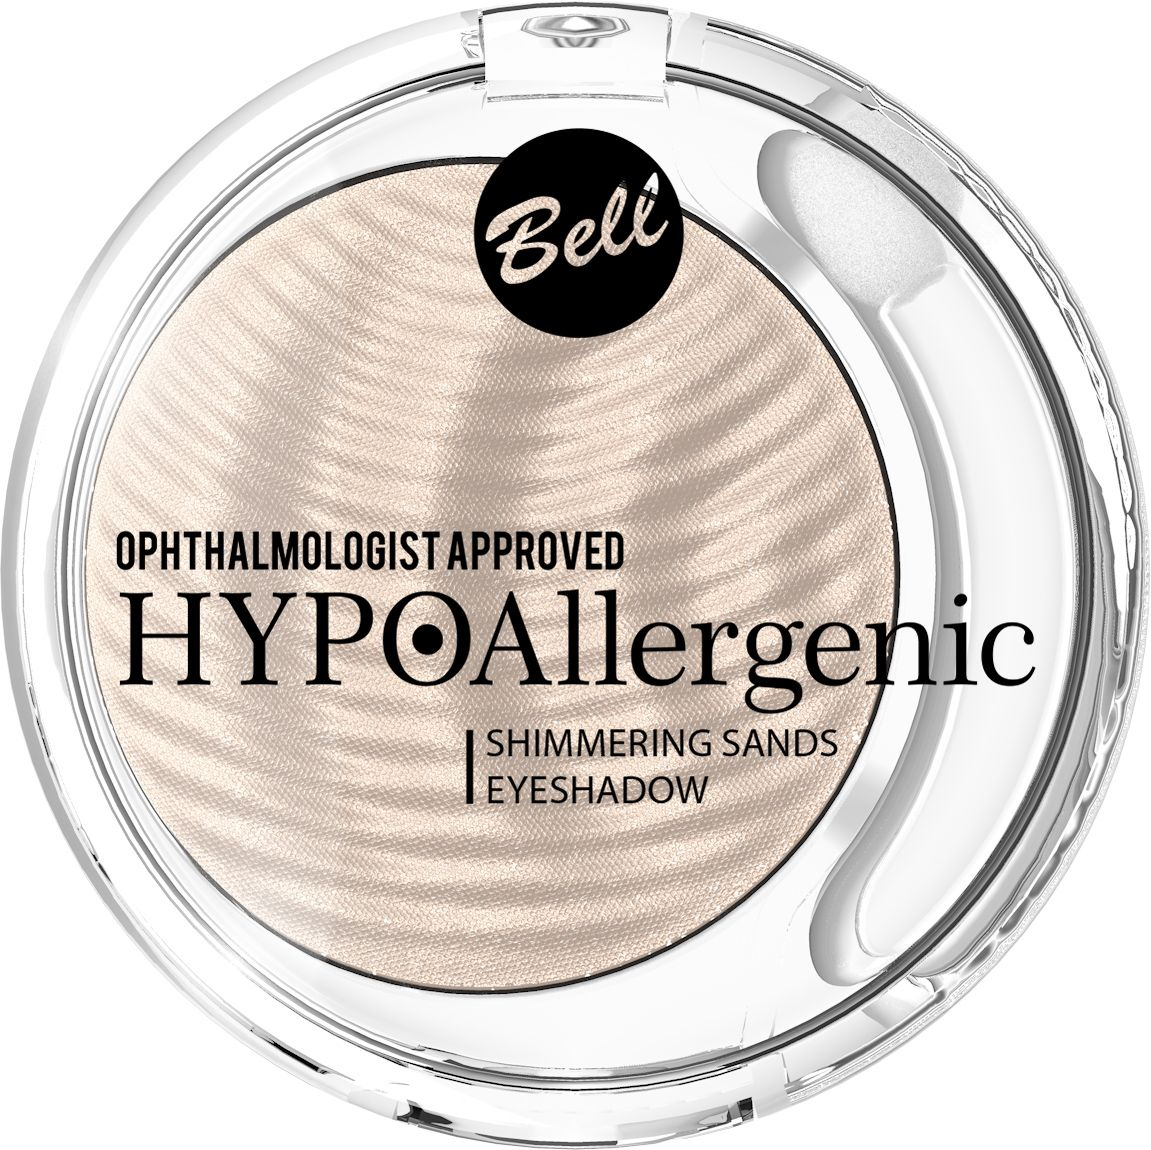 Bell Hypoallergenic Кремовые тени для век Shimmering Sands Eyeshadow, Тон №01BcssHA001